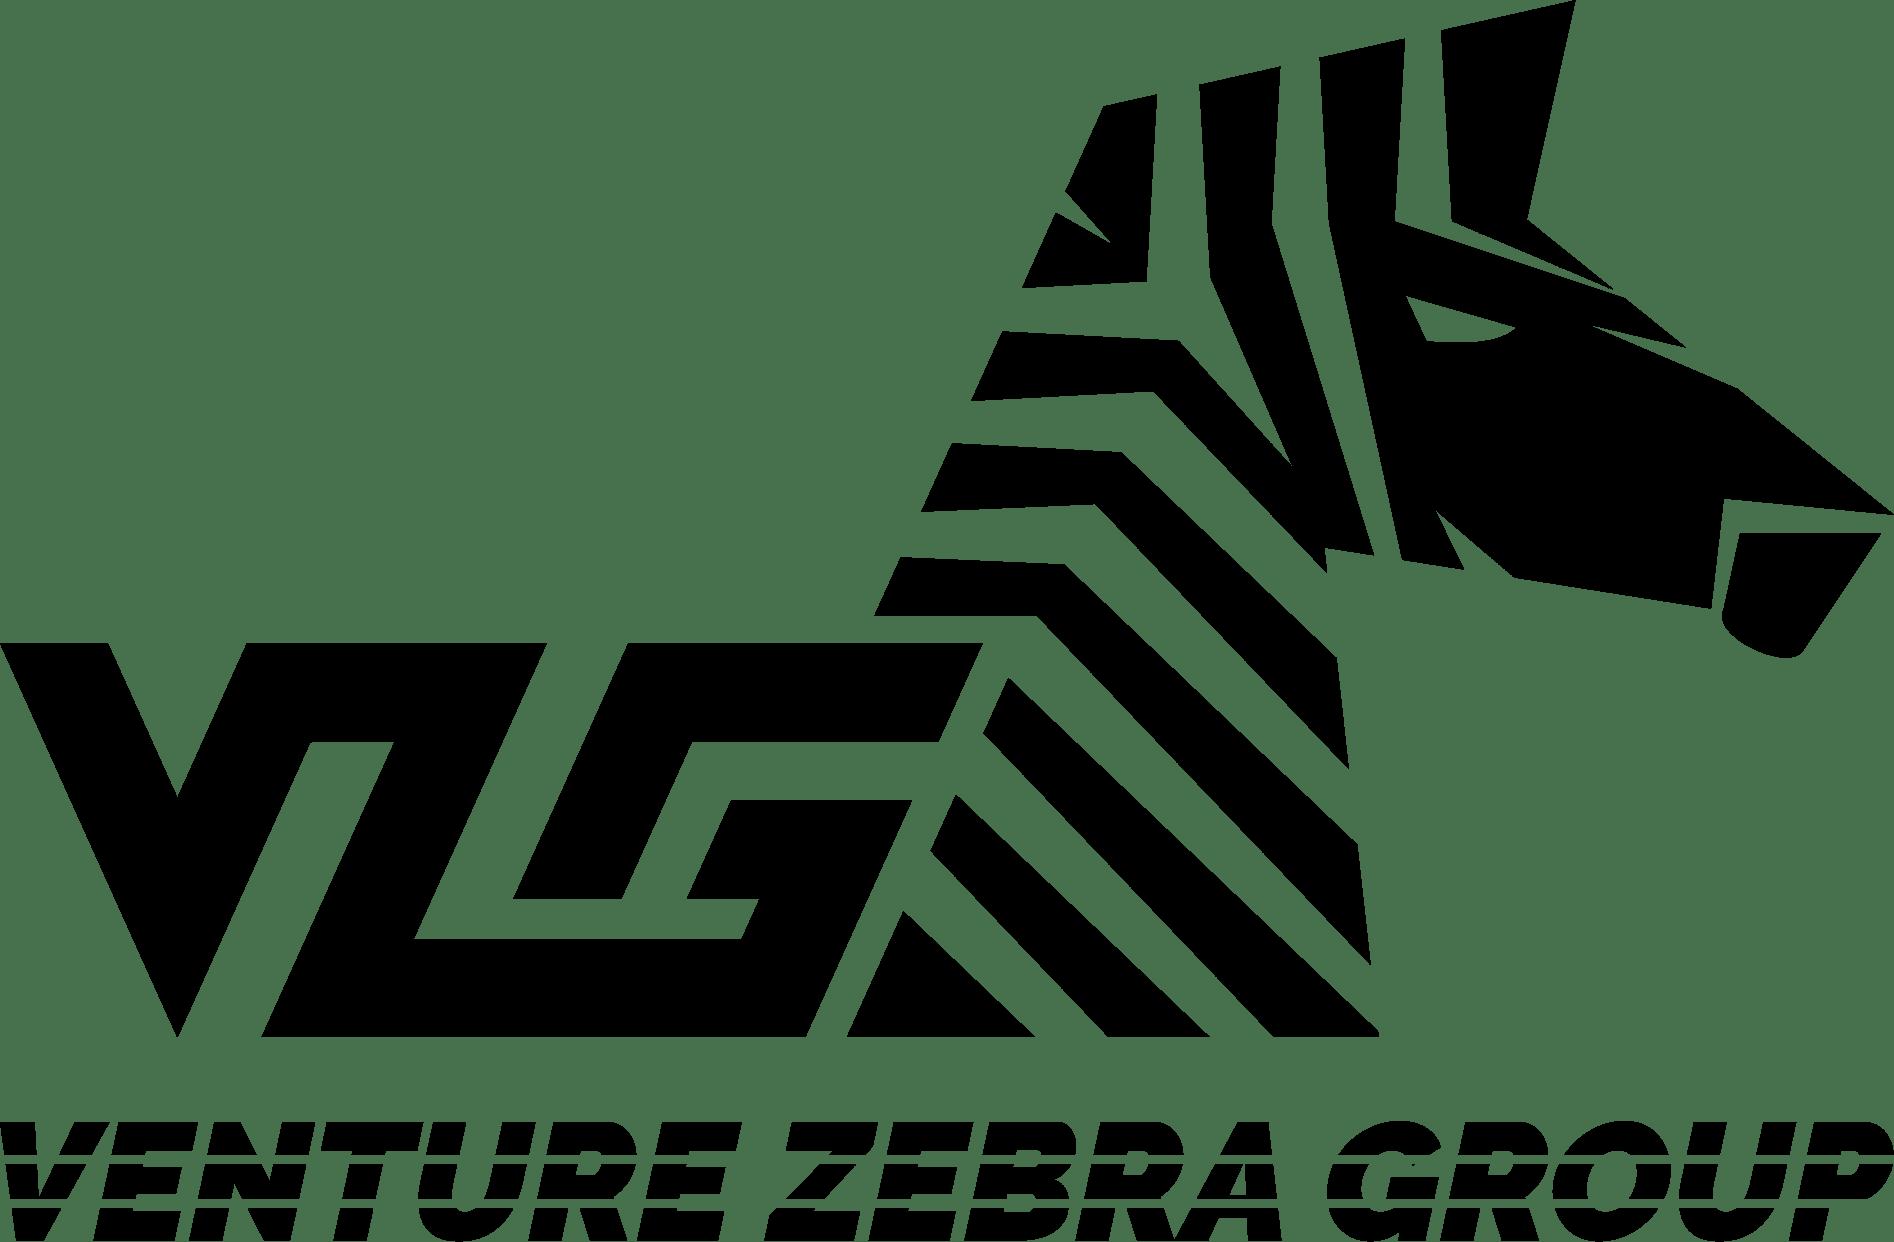 Venture Zebra Group